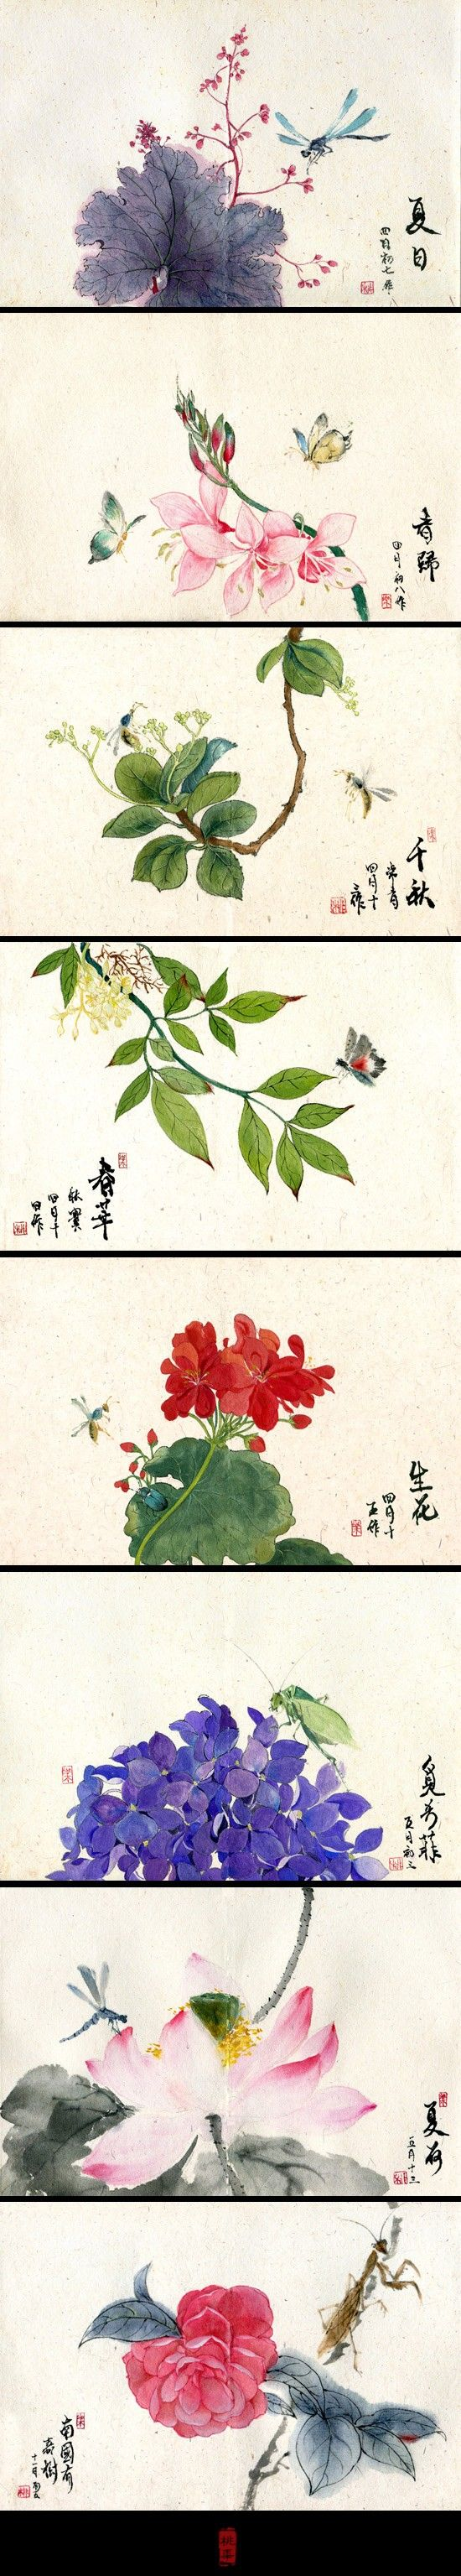 Chinese inks 转自:http://grace201605.lofter.com/post/7f882_37dc76